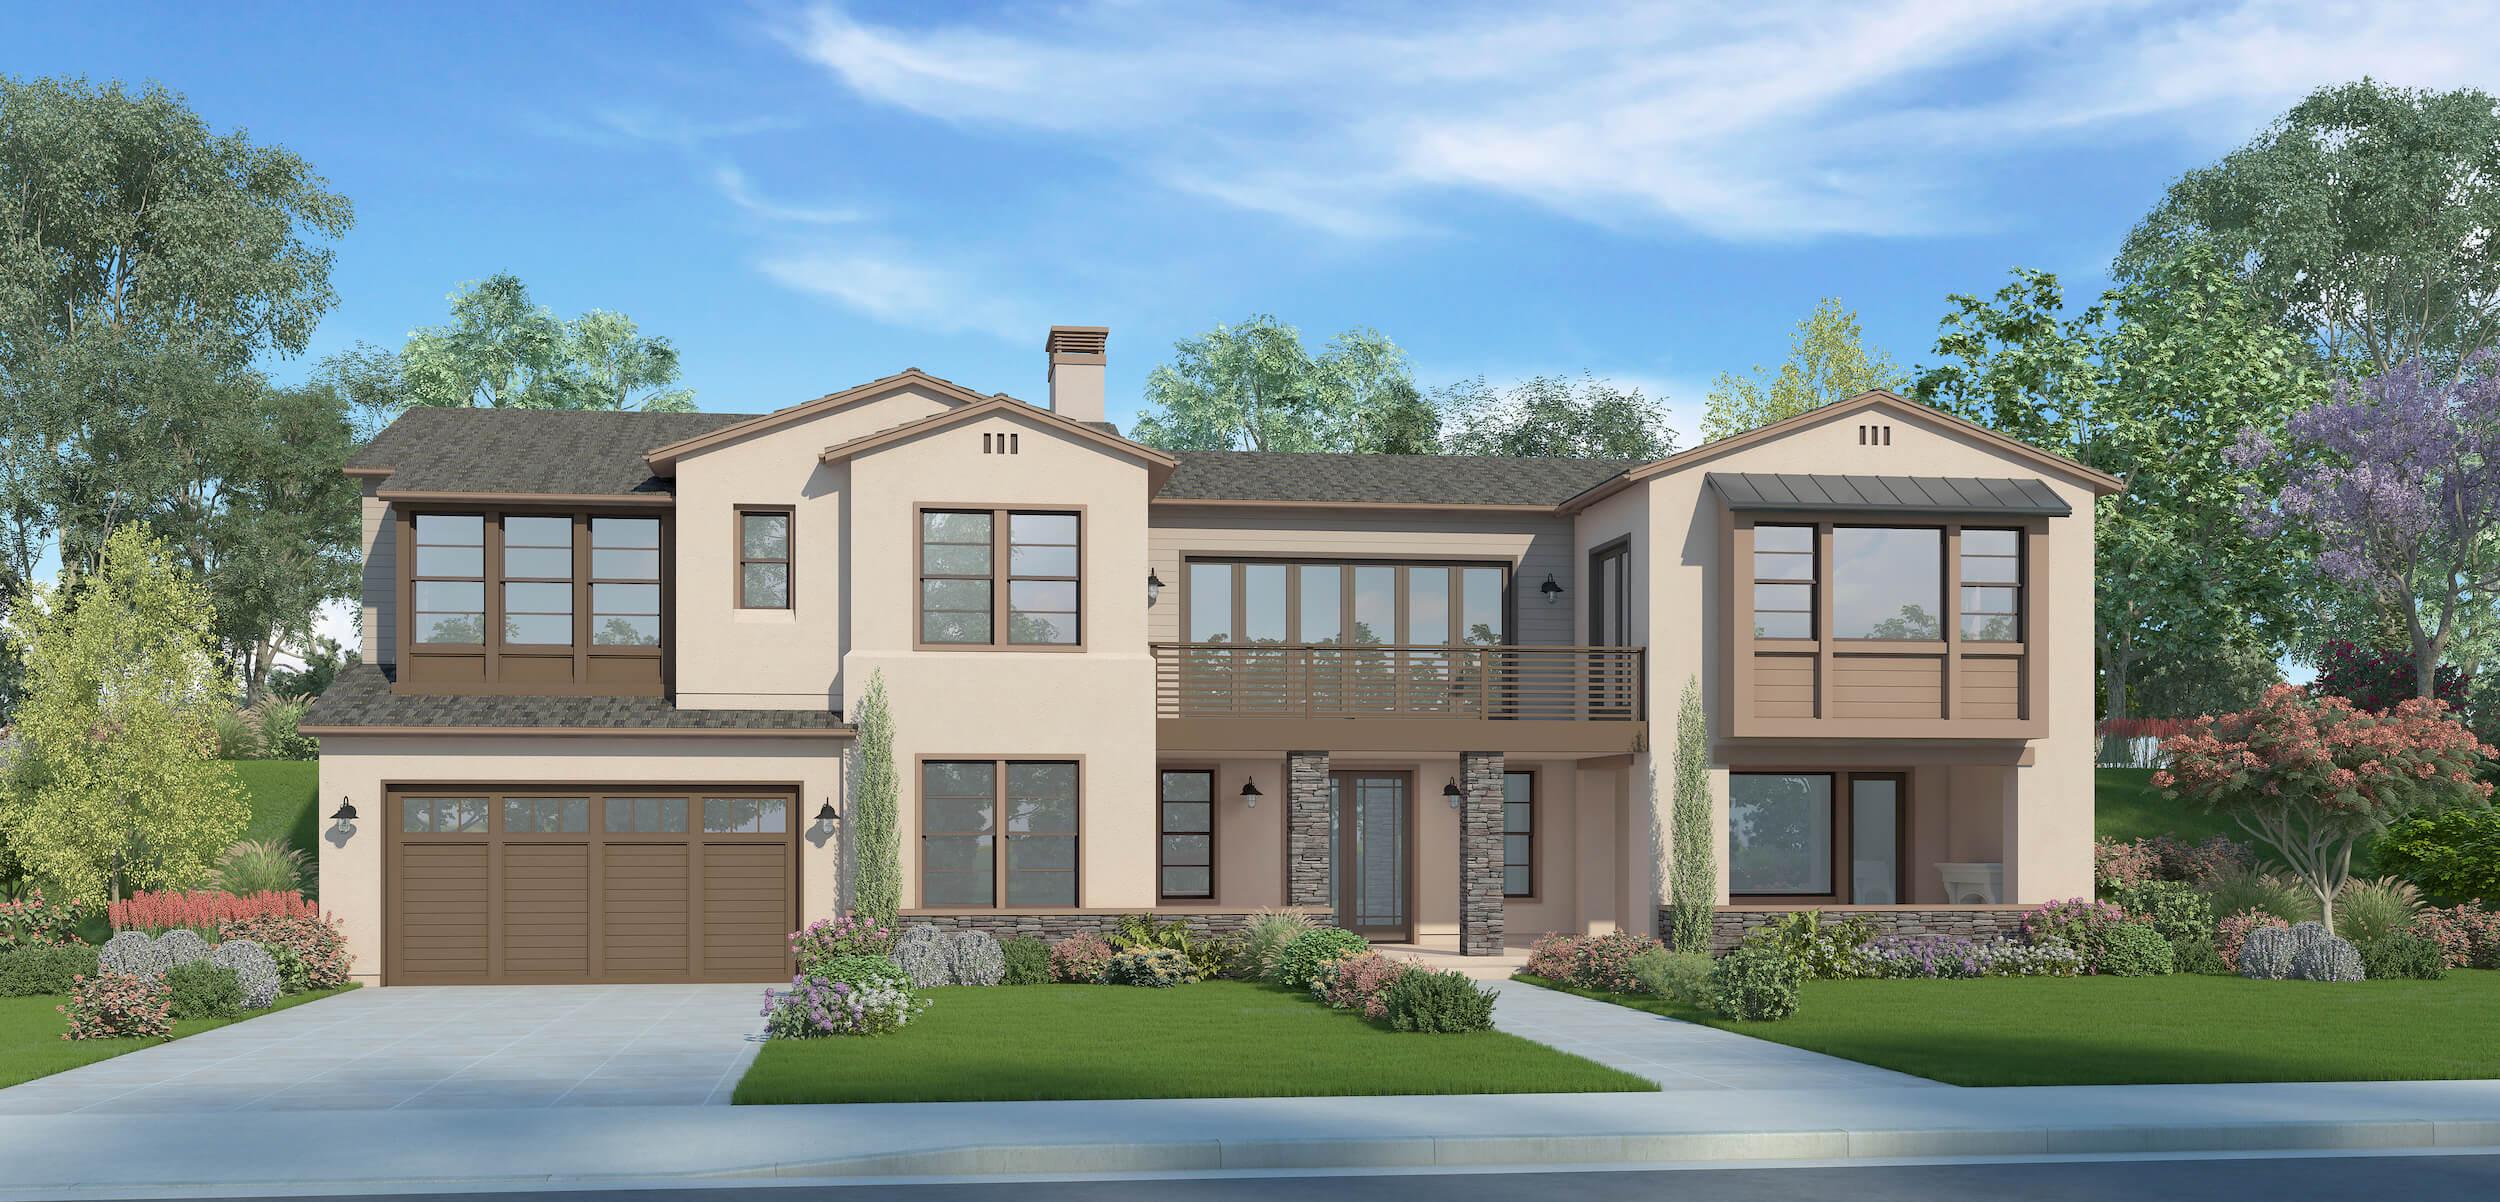 Plan 5A - California Ranch - 4,037 sf